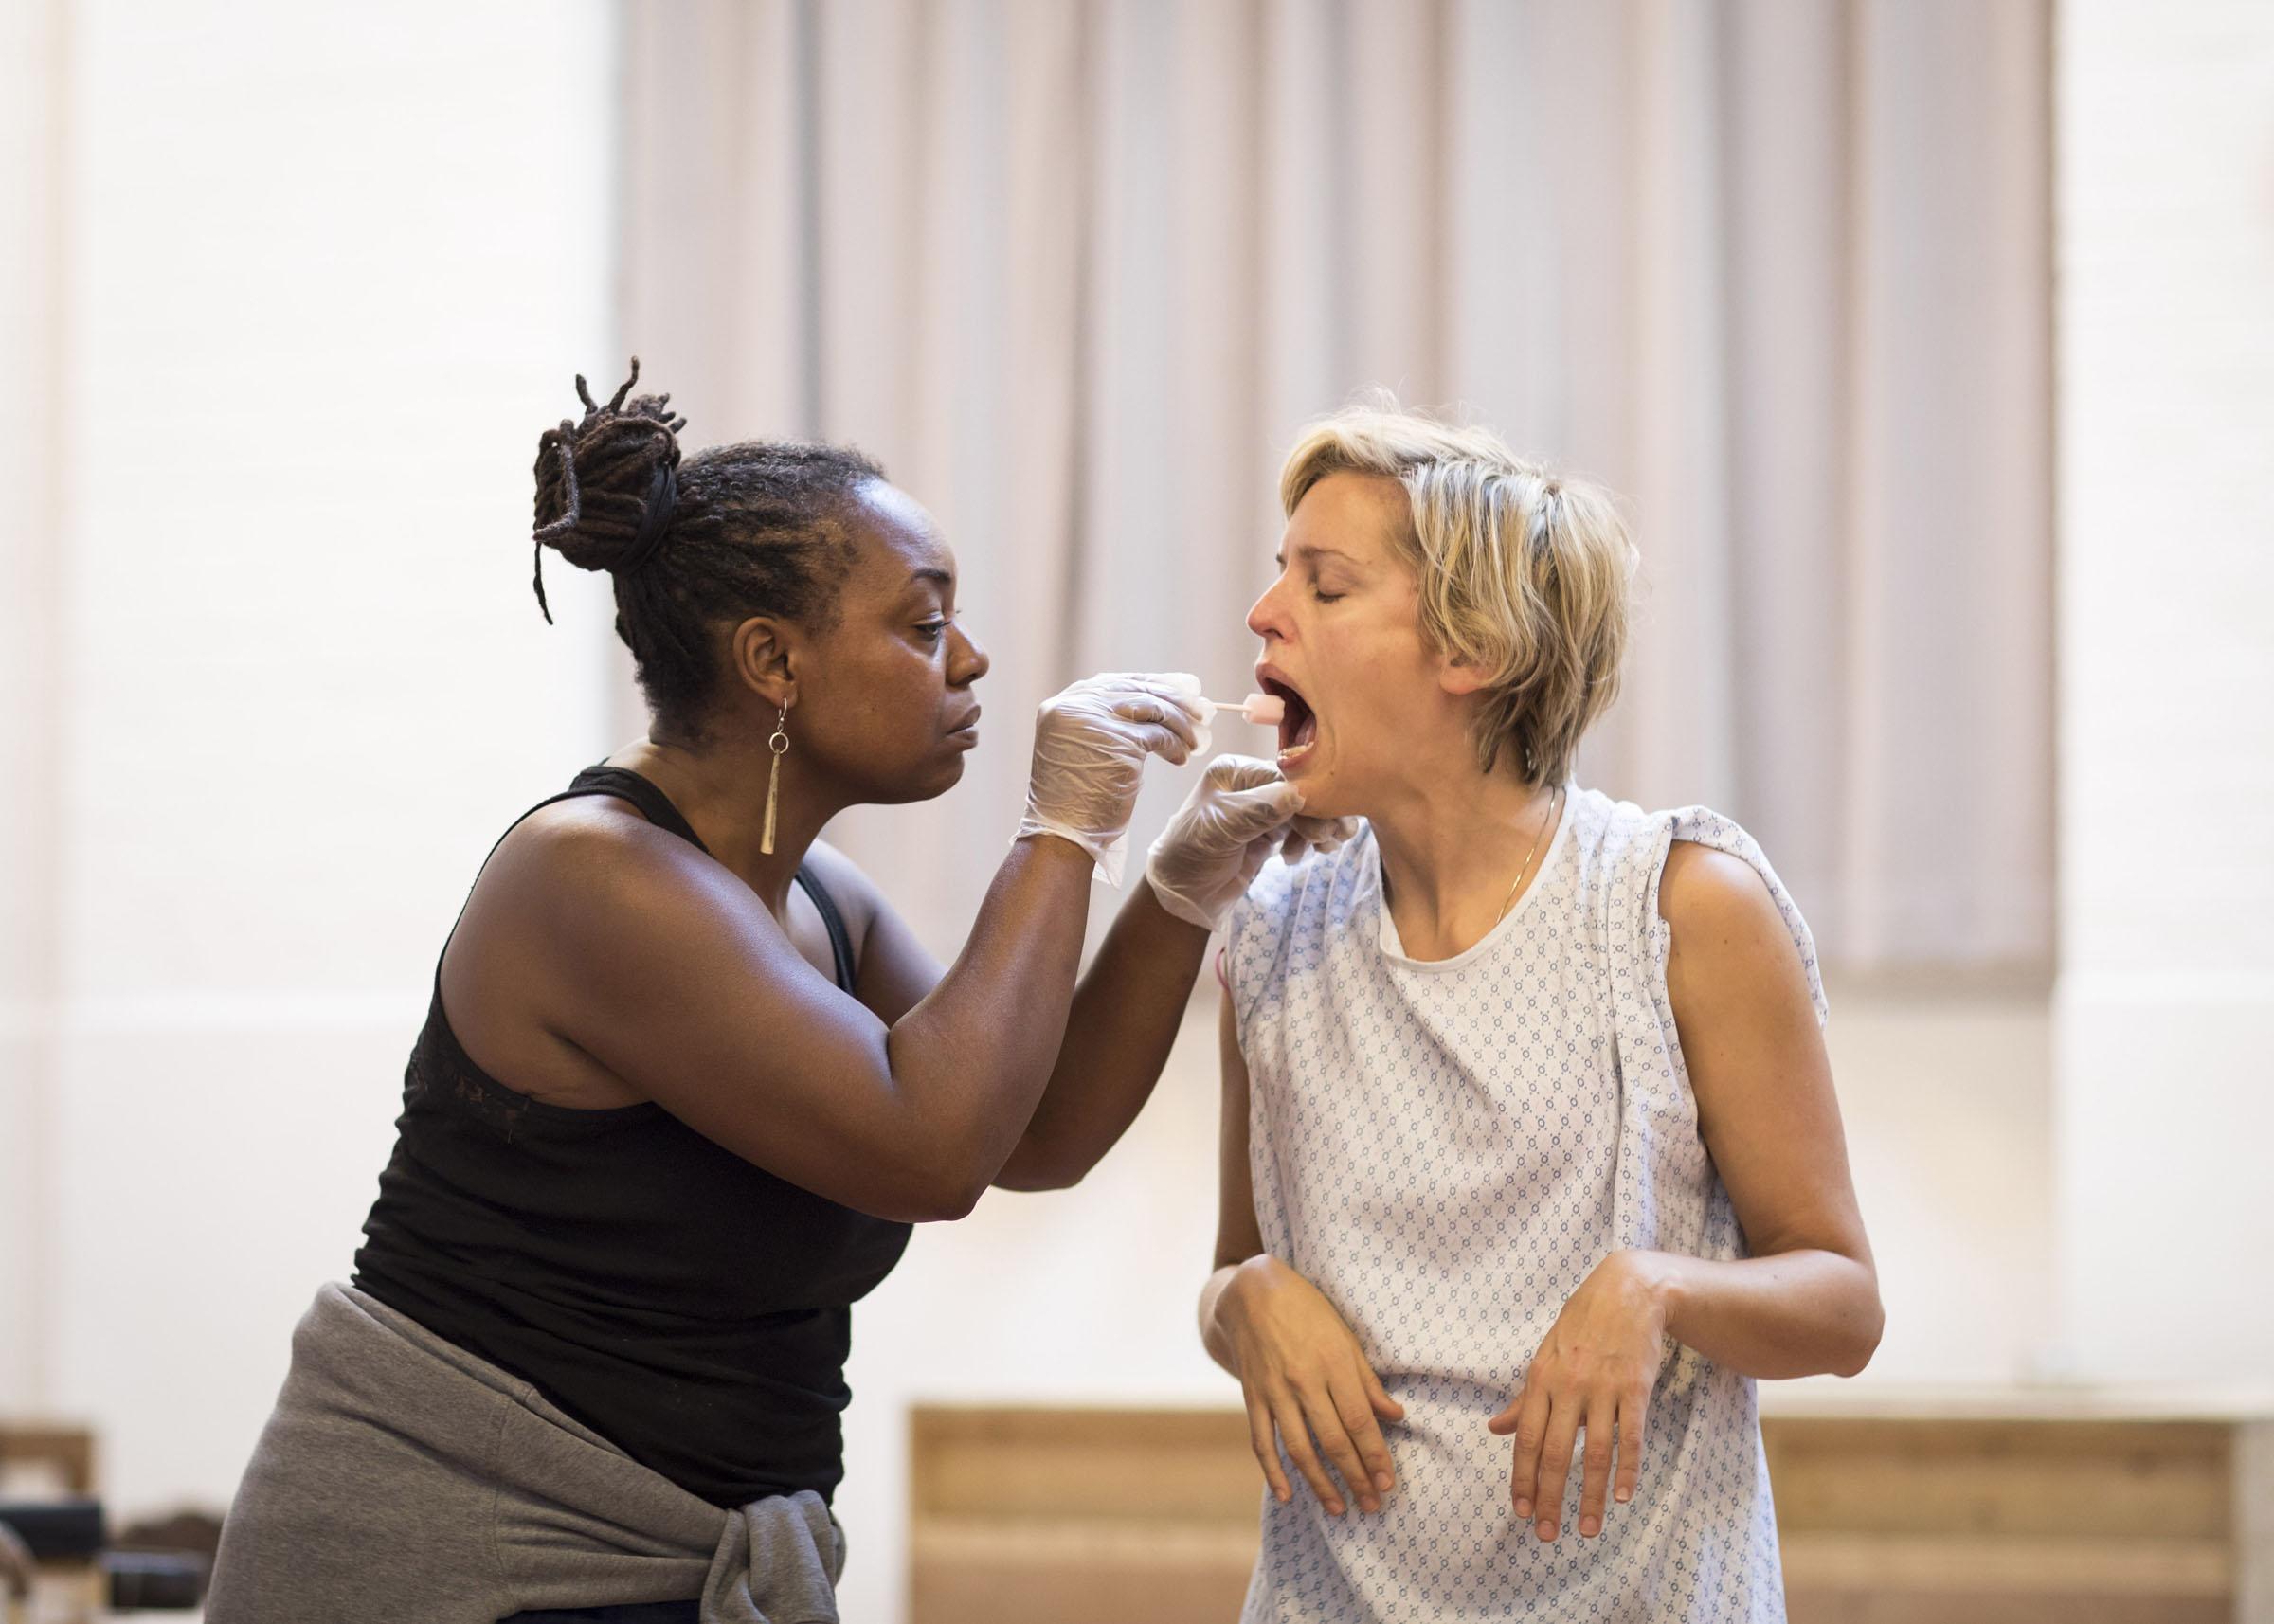 Jacqui Dubois and Denise Denise Gough